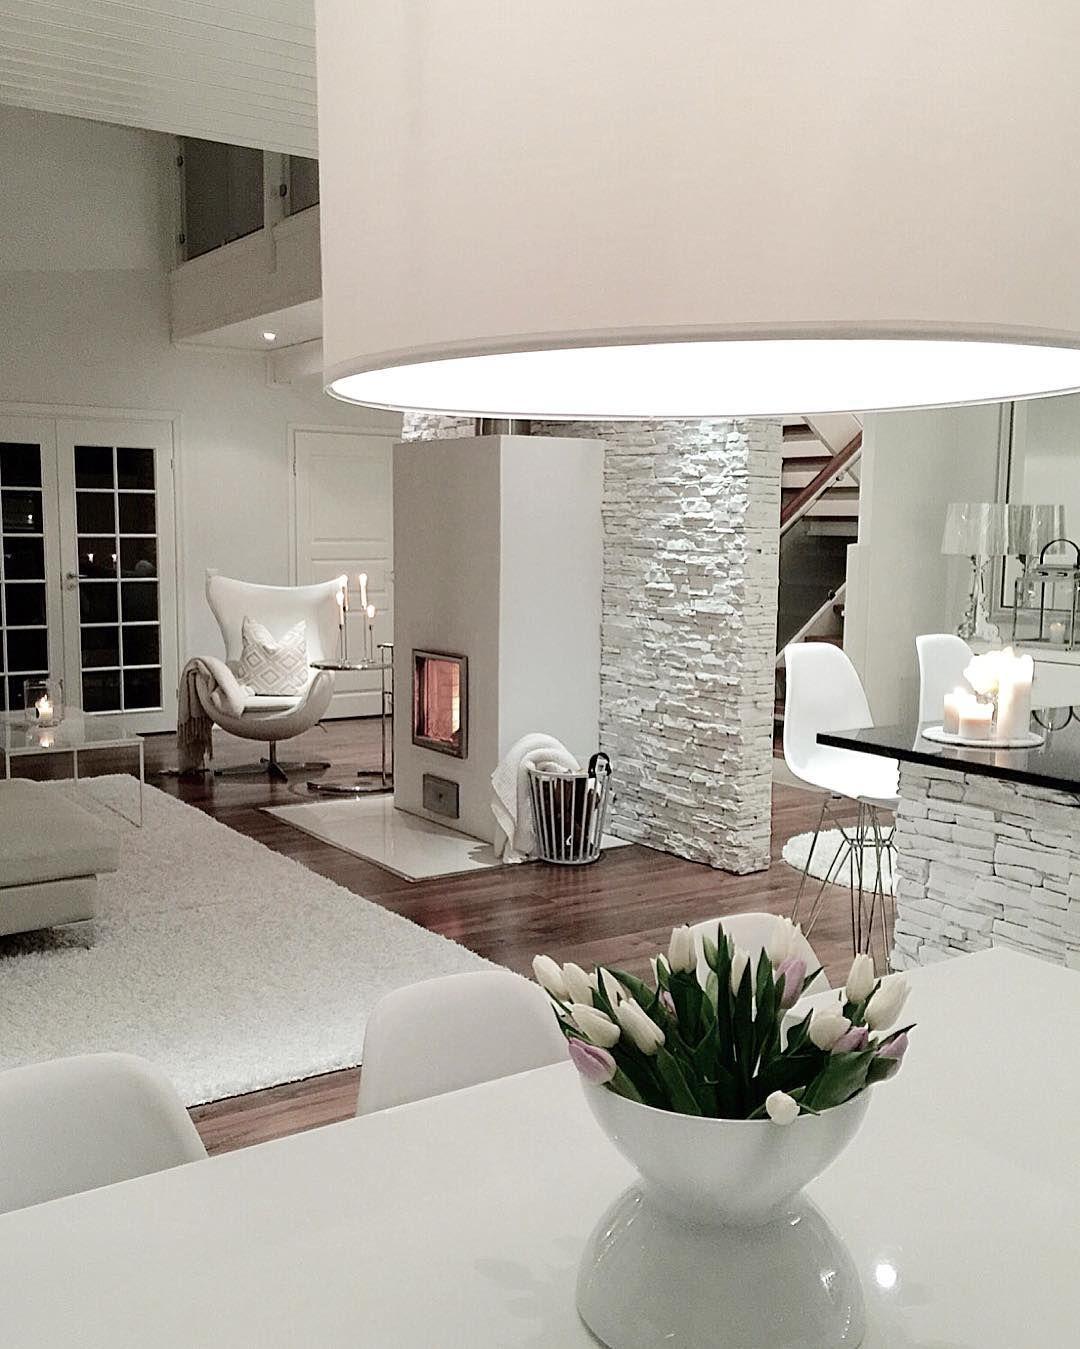 P ivi interior lifestyle p ivi pkliving on for Mobilia instagram